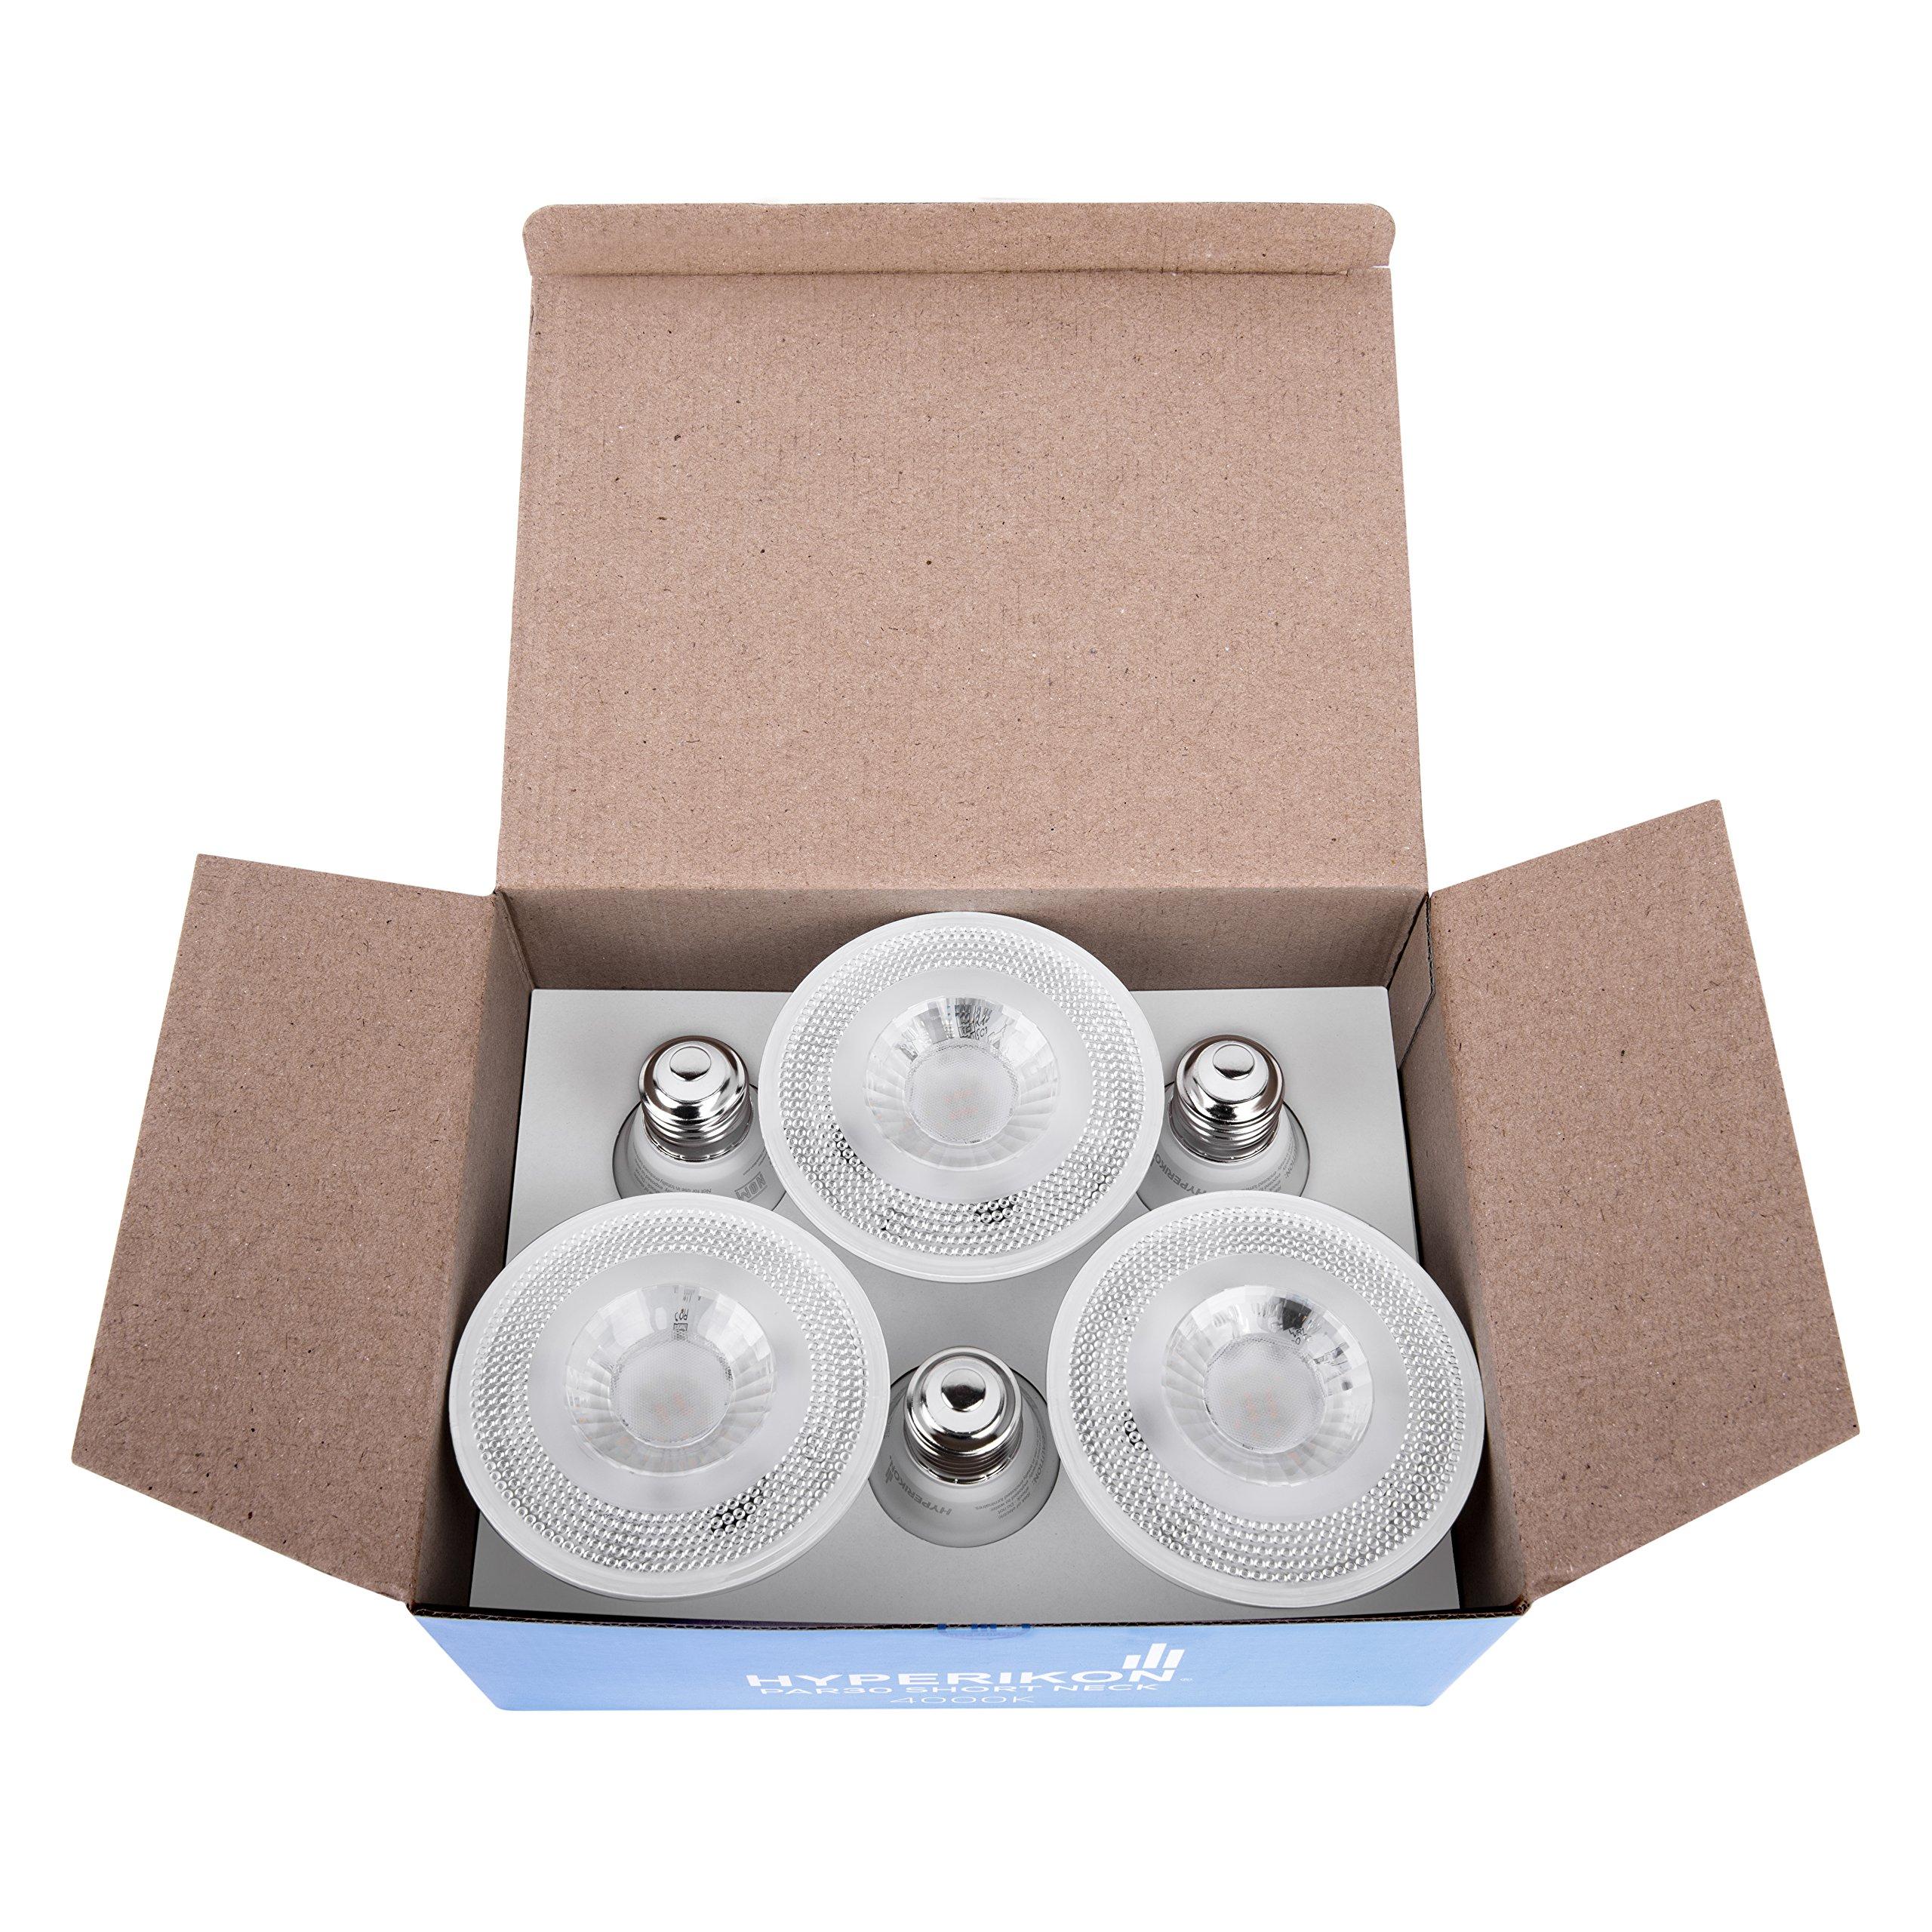 Hyperikon PAR30 Short Neck LED Bulb, Dimmable, 10W (65W Equivalent), 4000K (Daylight Glow) 840 lm, CRI 90+, Flood Bulb, Medium Base (E26), UL & Energy Star - Great for Work Areas, Kitchen (6 Pack) by Hyperikon (Image #2)